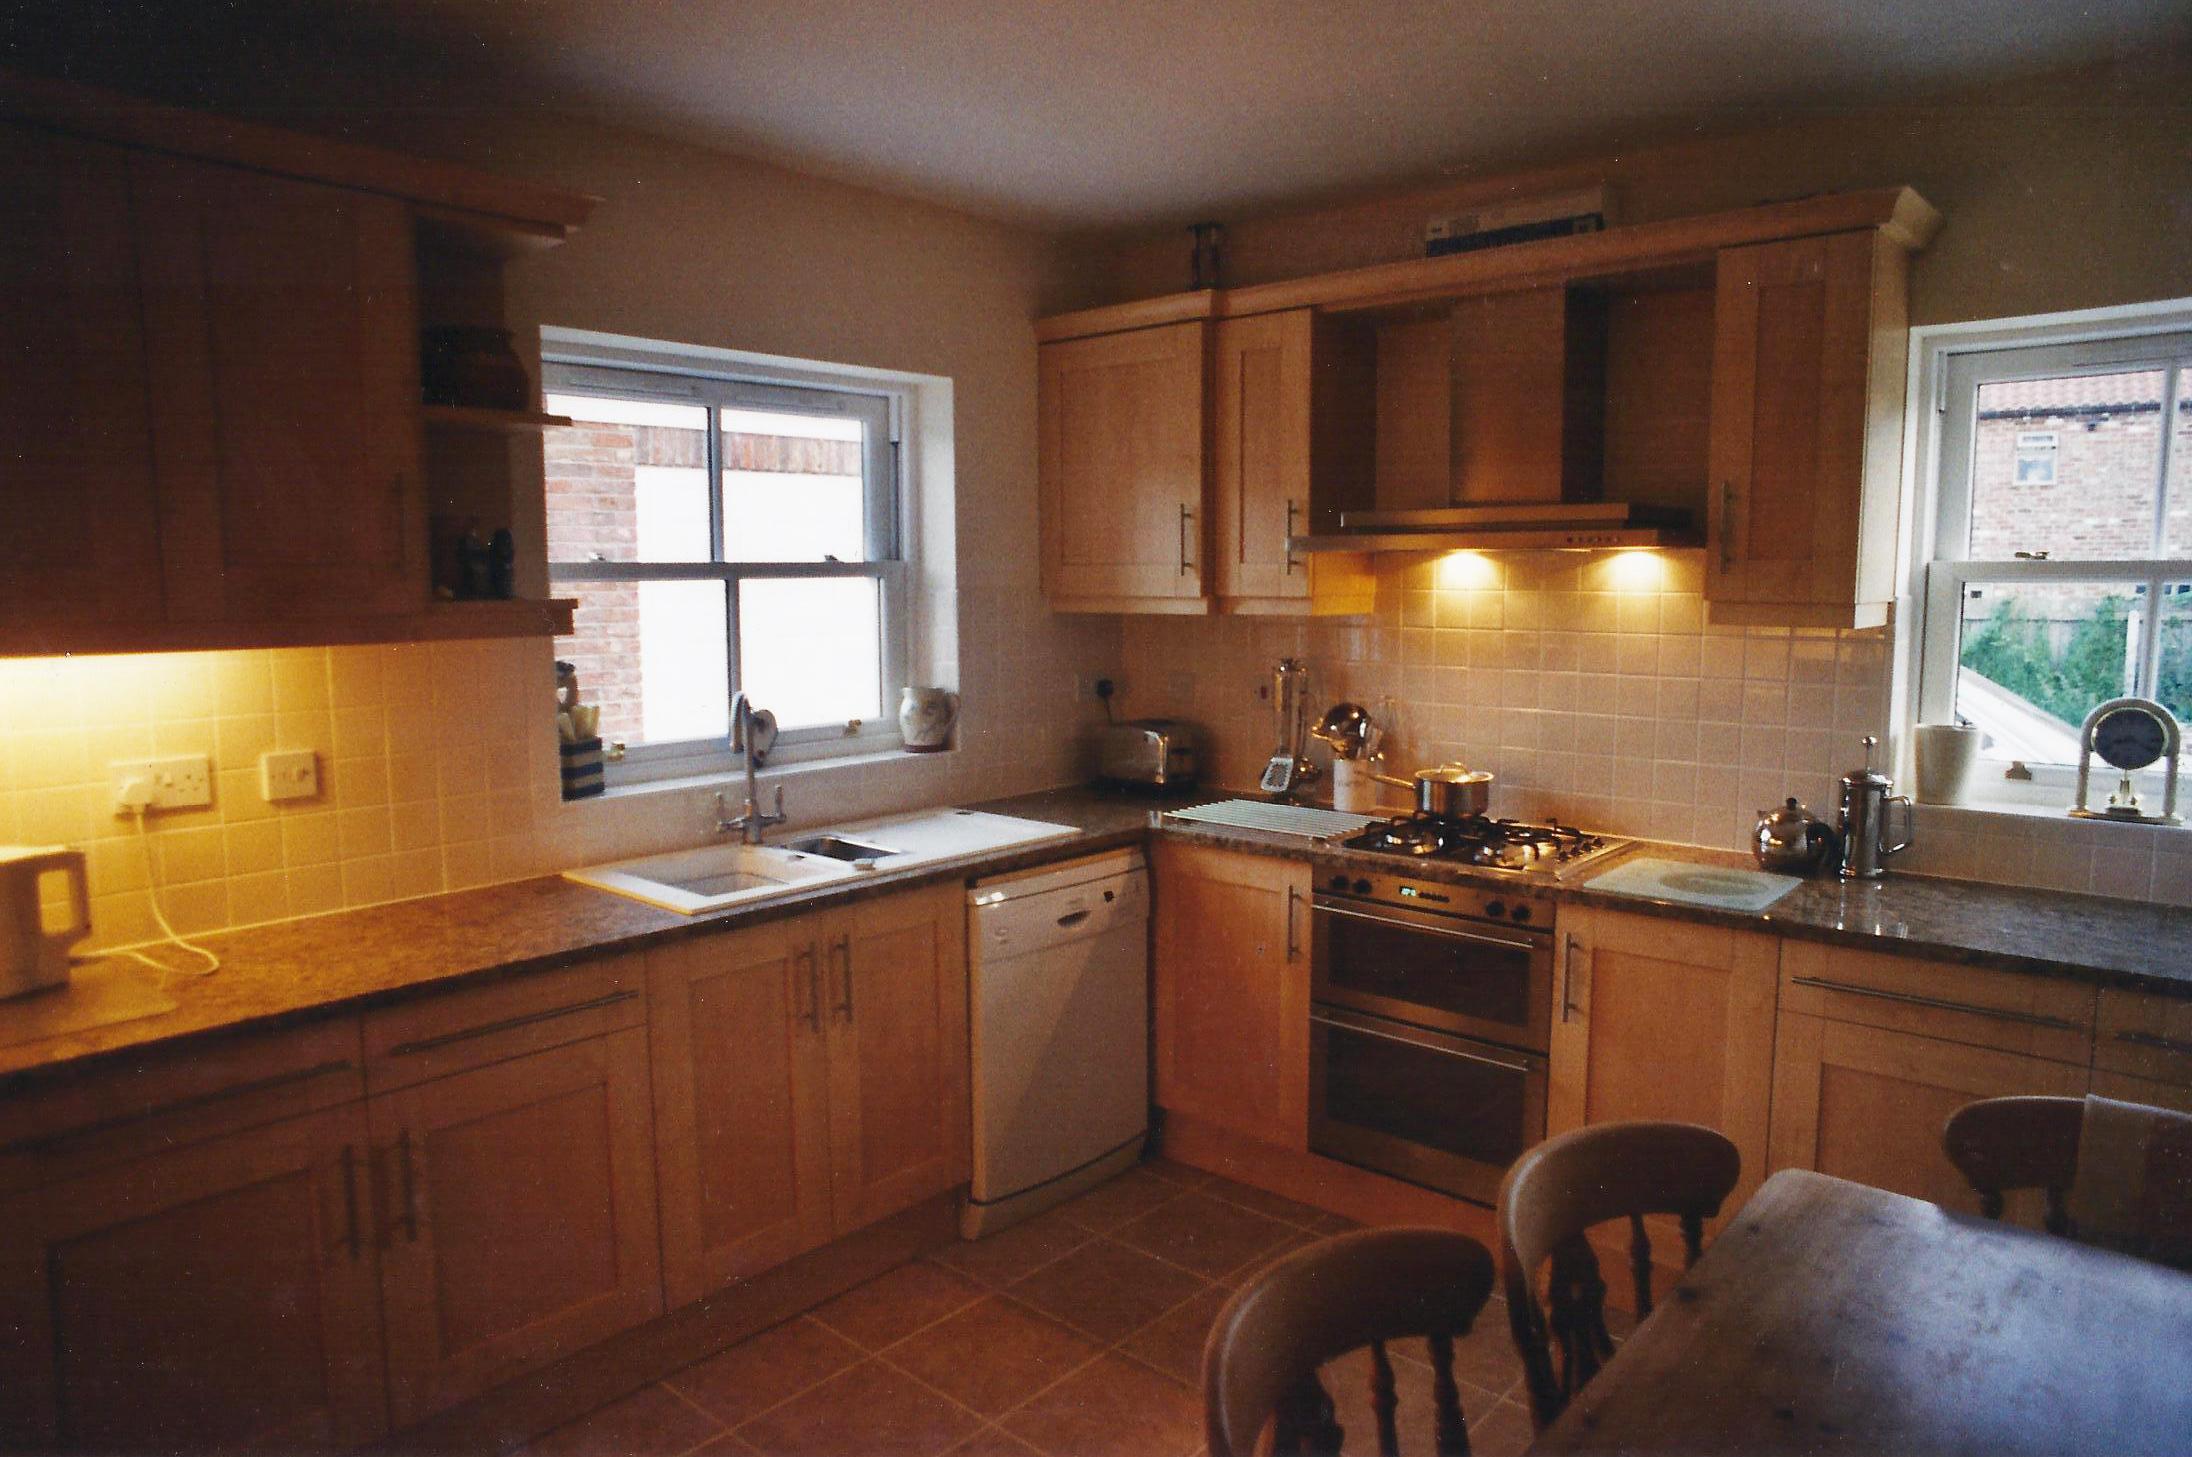 Blenheim Cottage 7 - East Yorkshire Architects - Samuel Kendall Associates.jpg